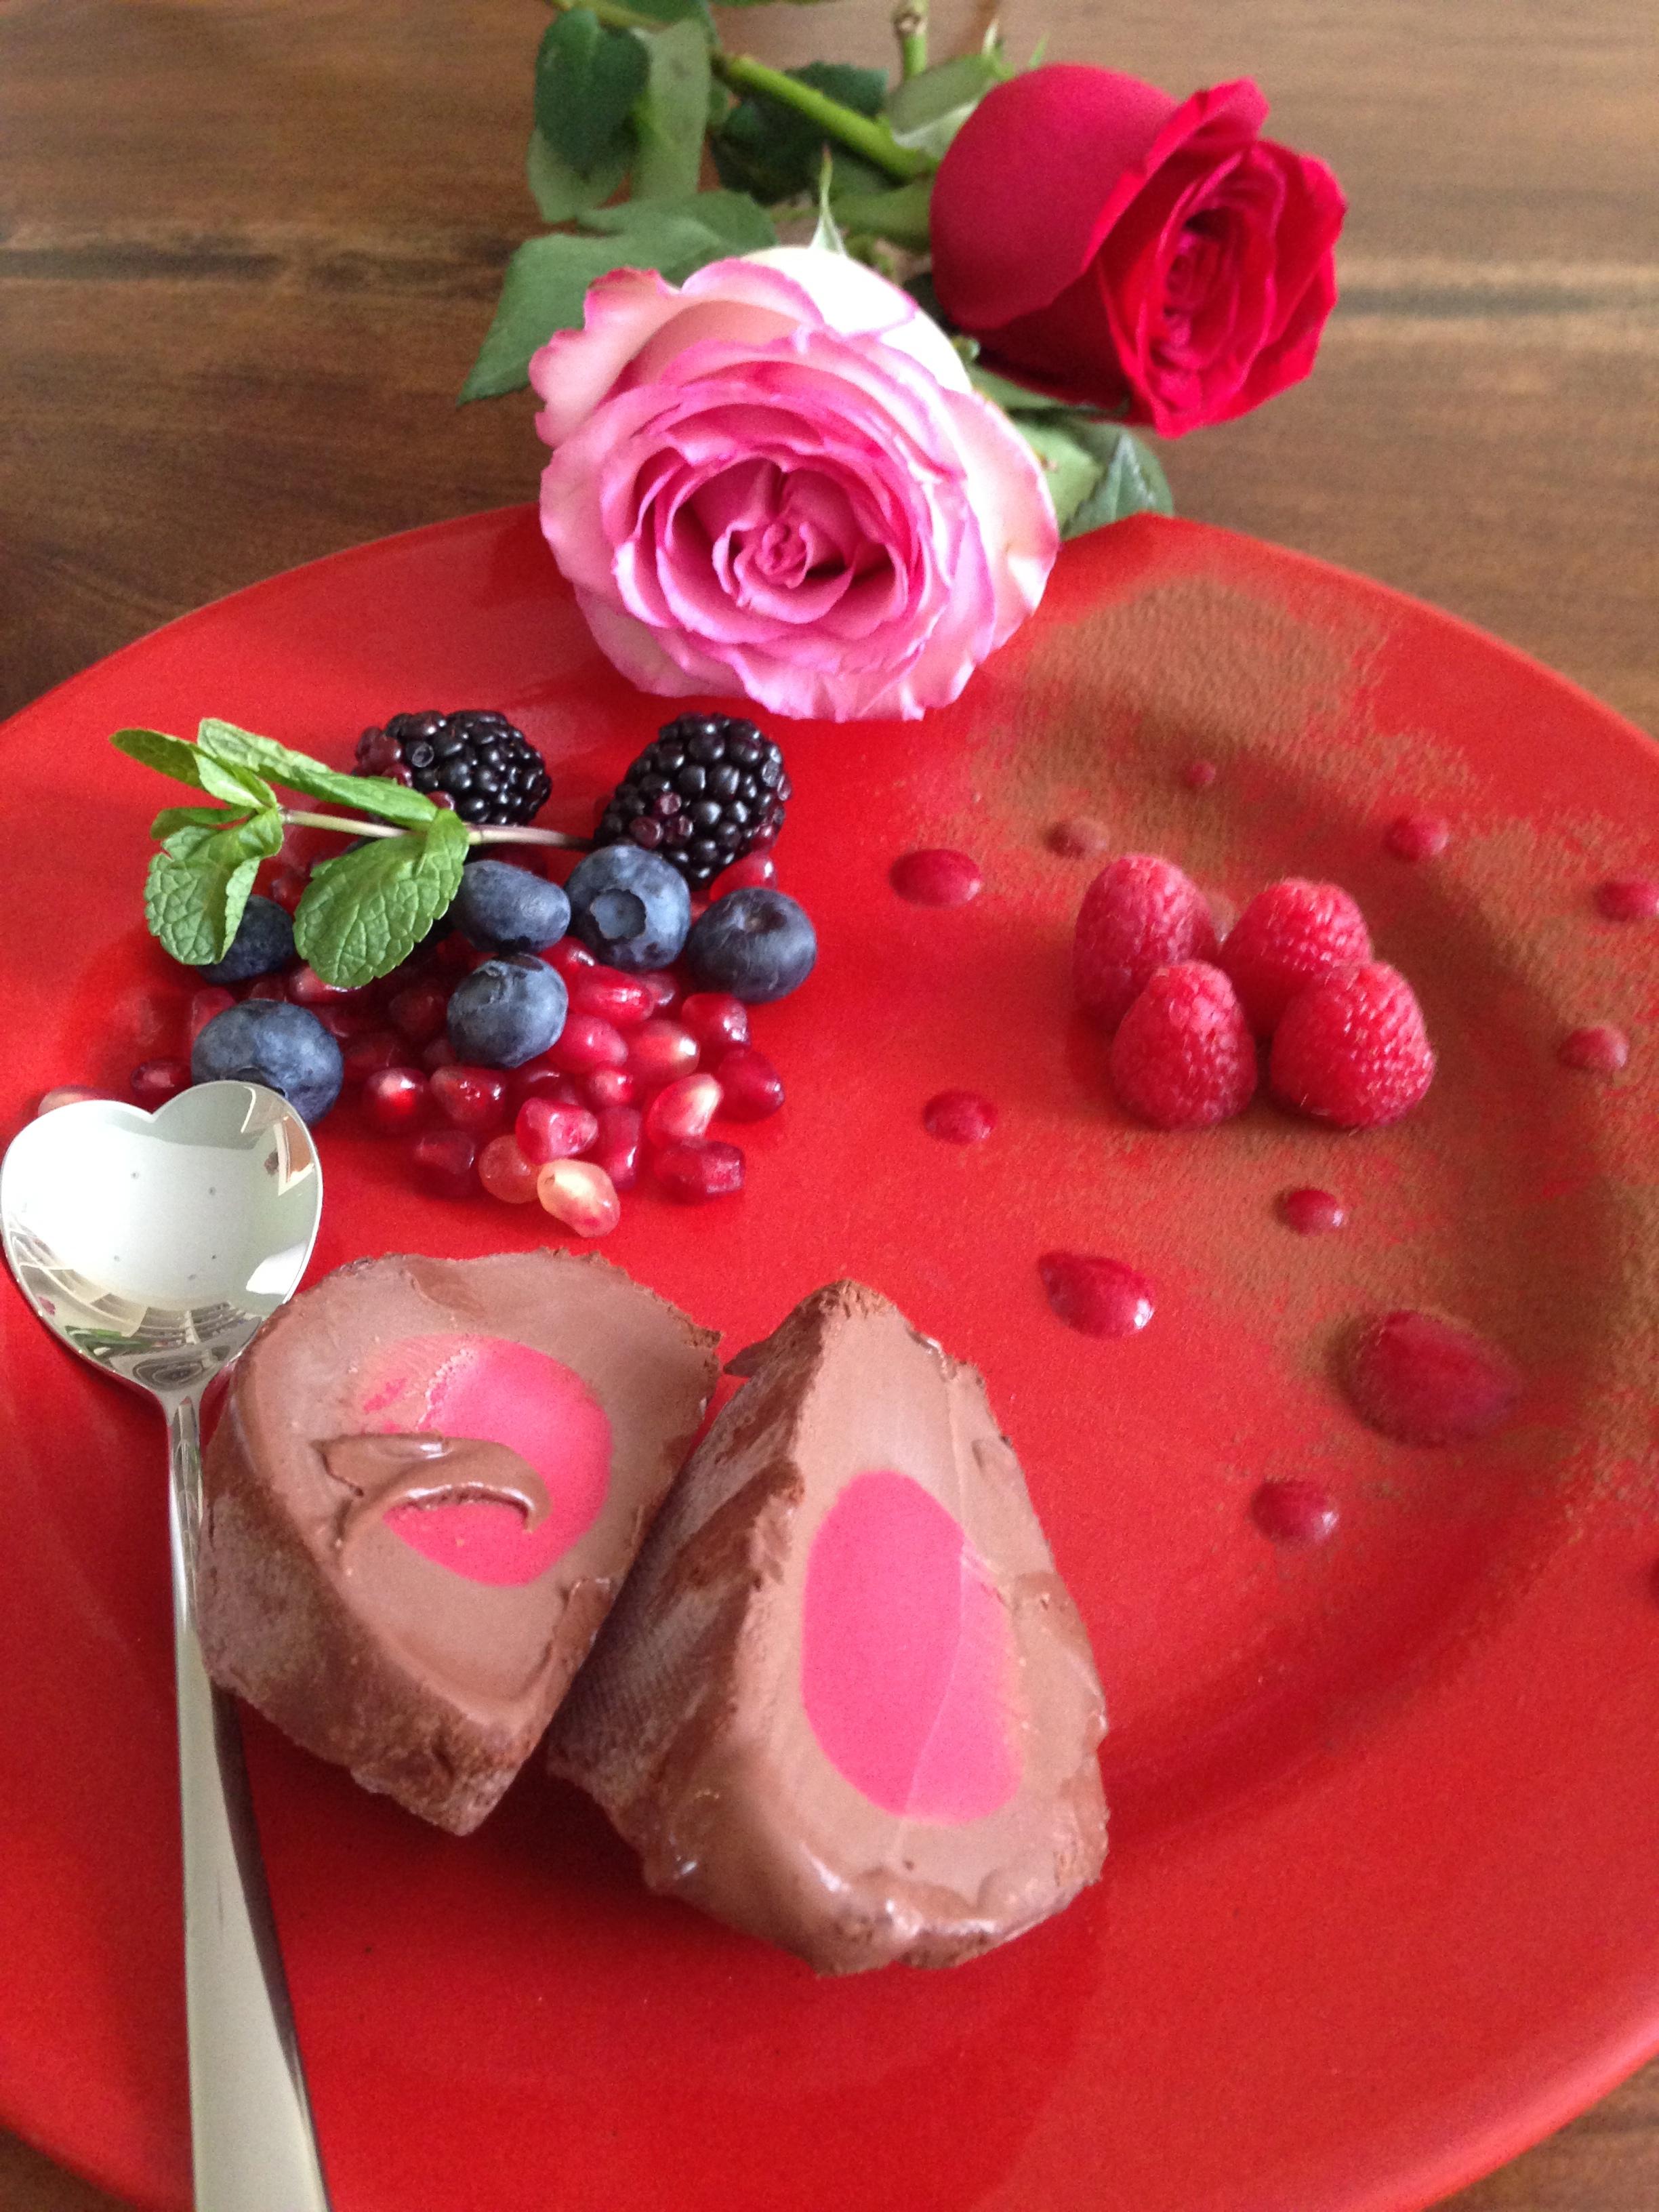 Raspberry Chocolate Tartufo 125 gms